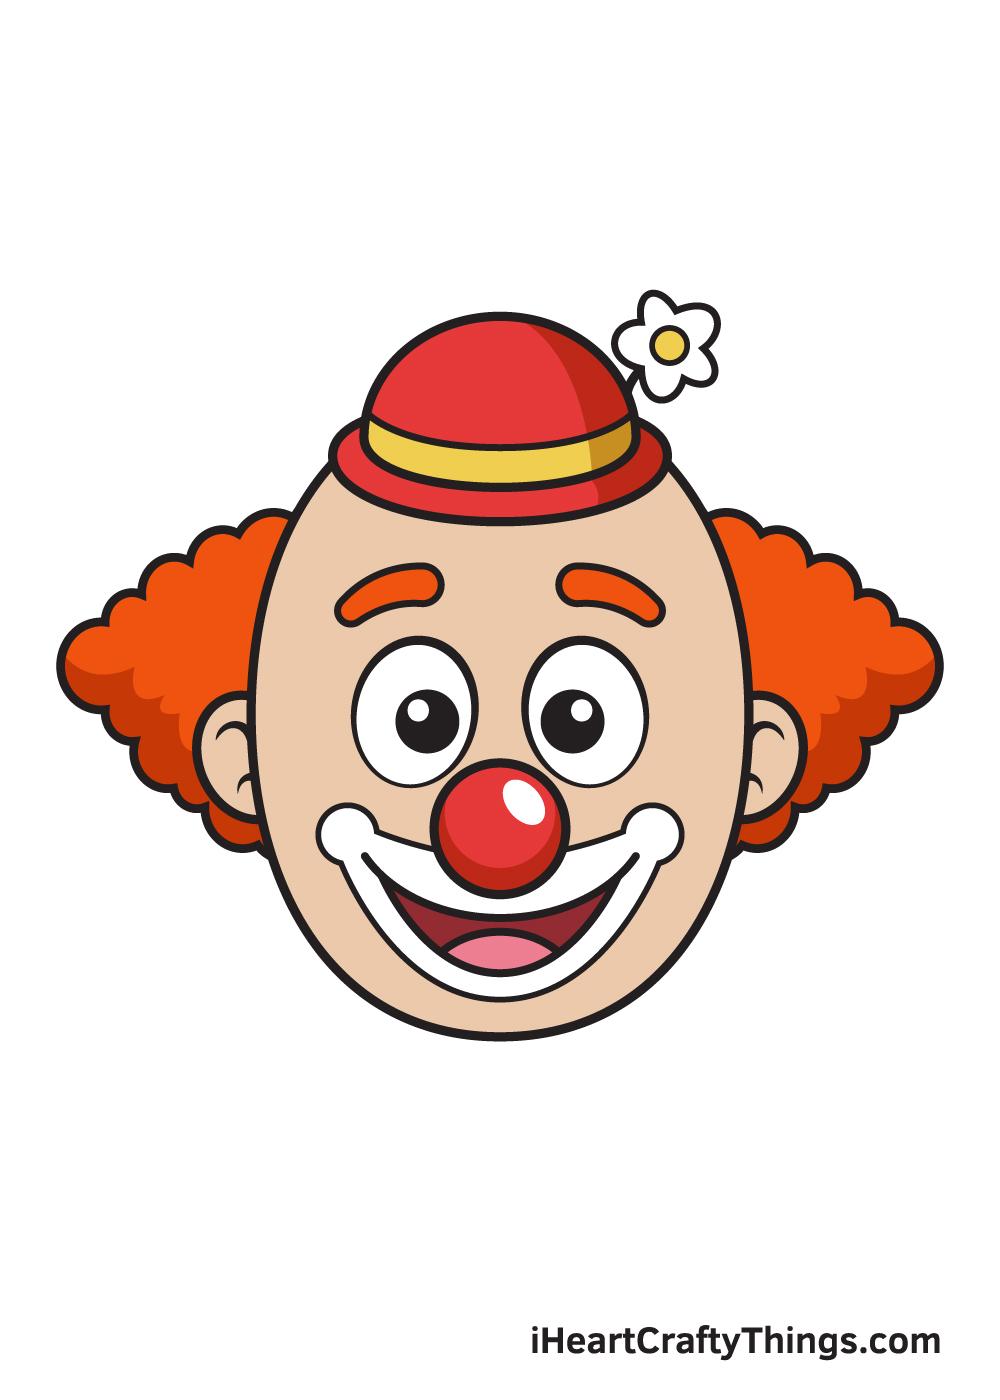 clown drawing 9 steps